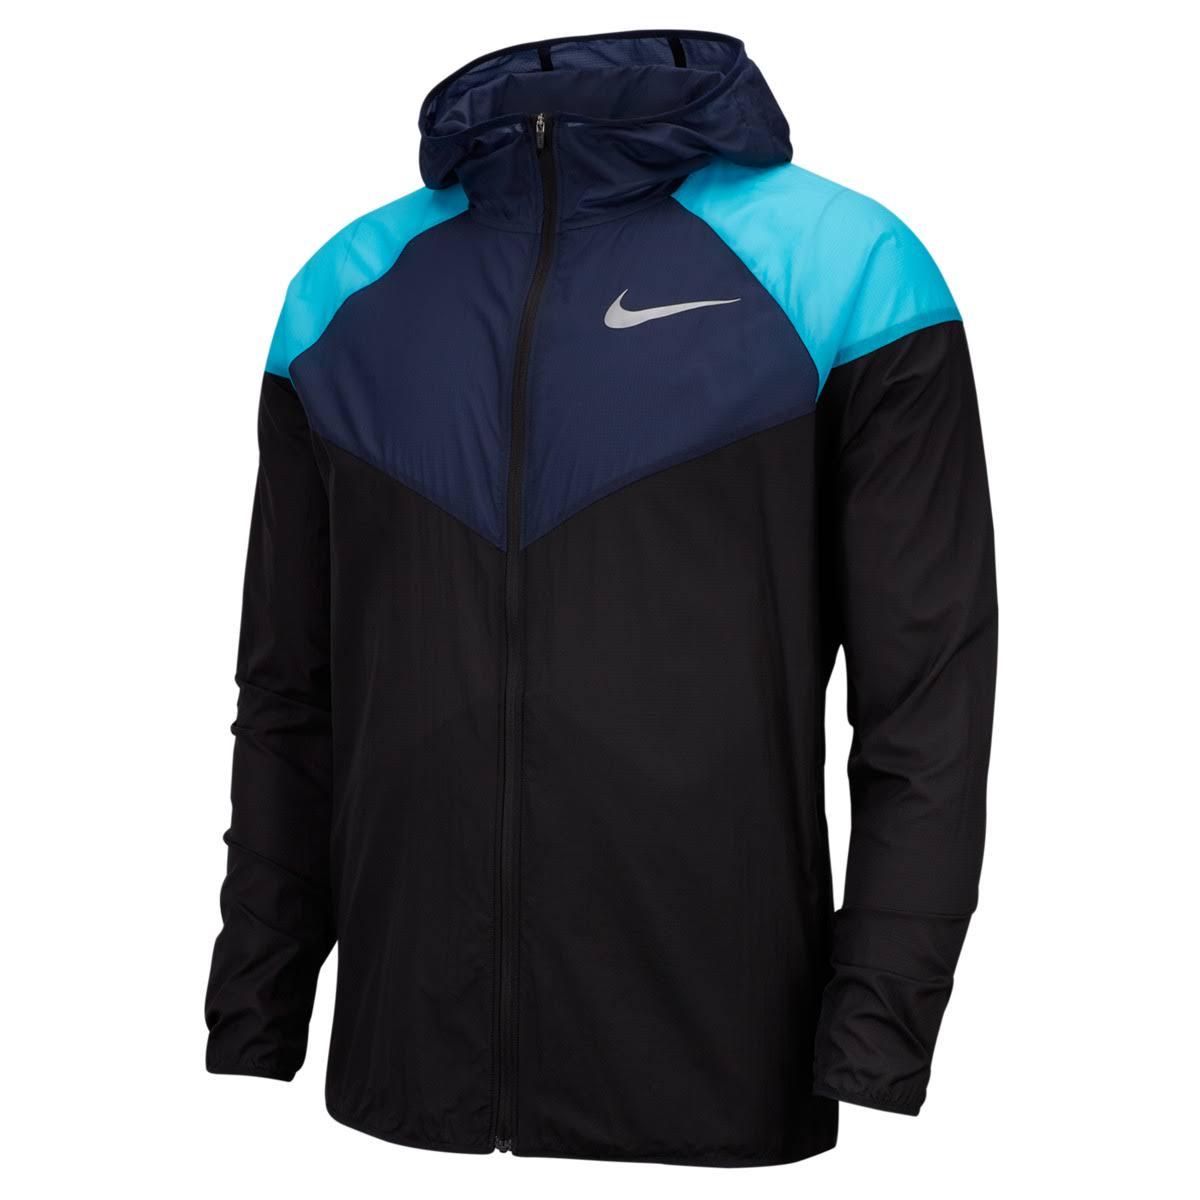 Negro Reflectante Obsidiana Talla Nike S Plata Jacket Mens Windrunner BwCxW1qX